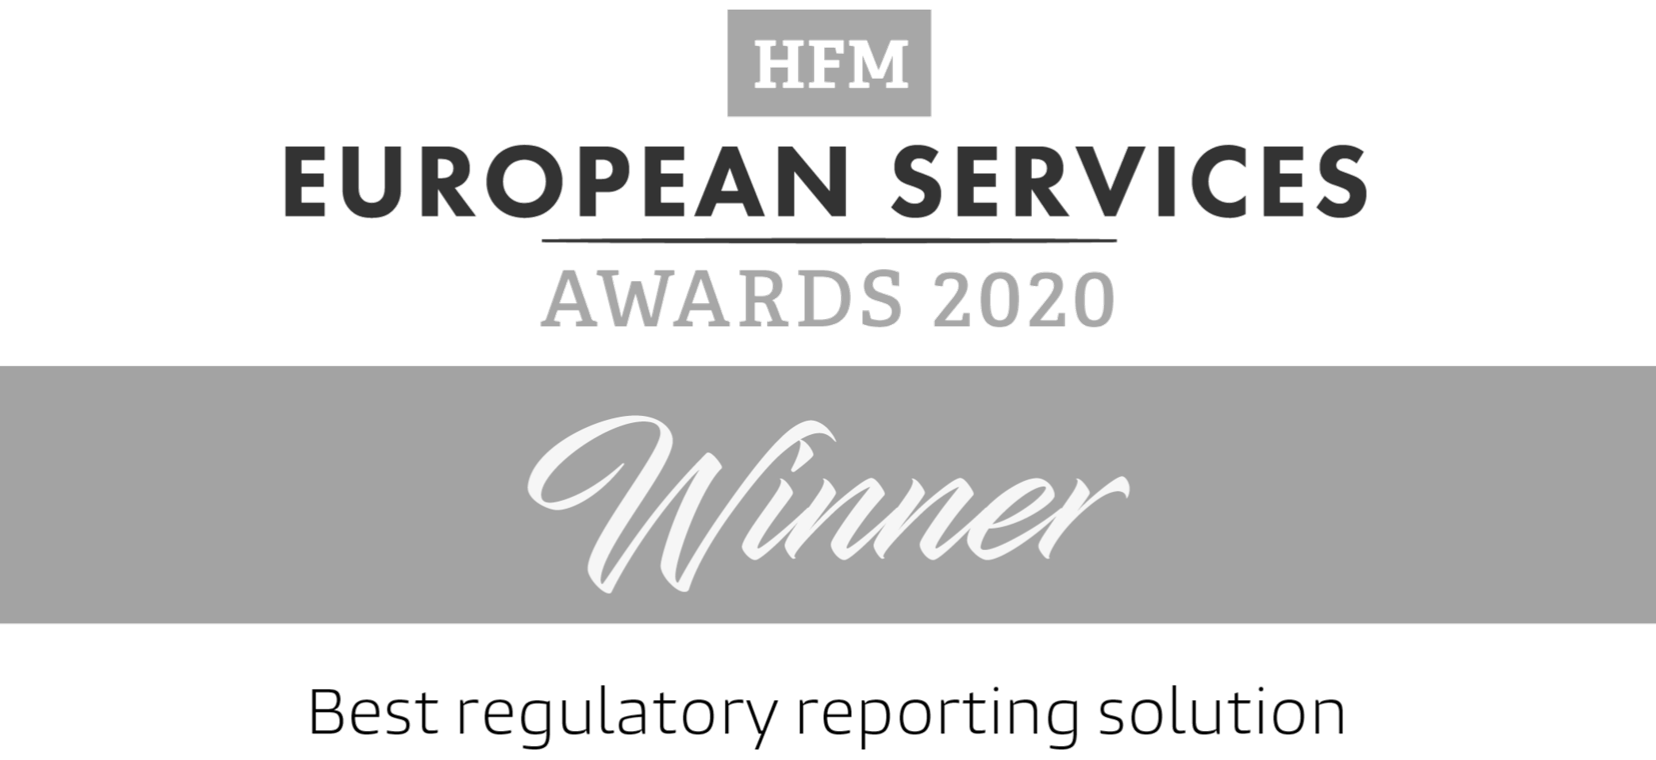 HFM European Services Awards 2020 - SteelEye Winner